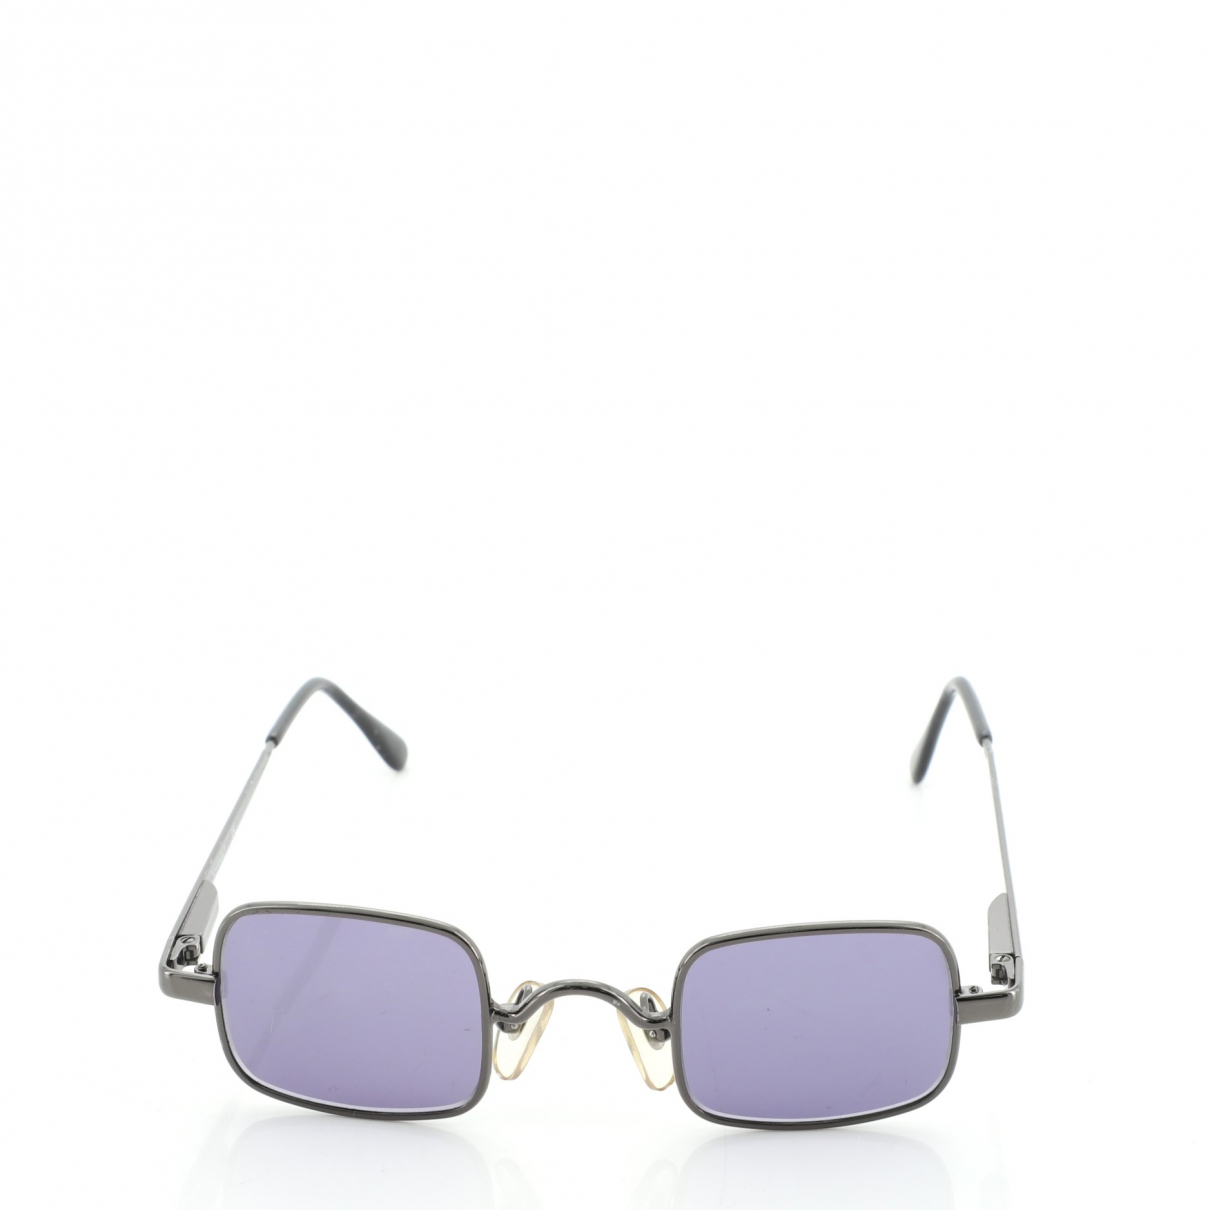 Chanel \N Grey Sunglasses for Women \N